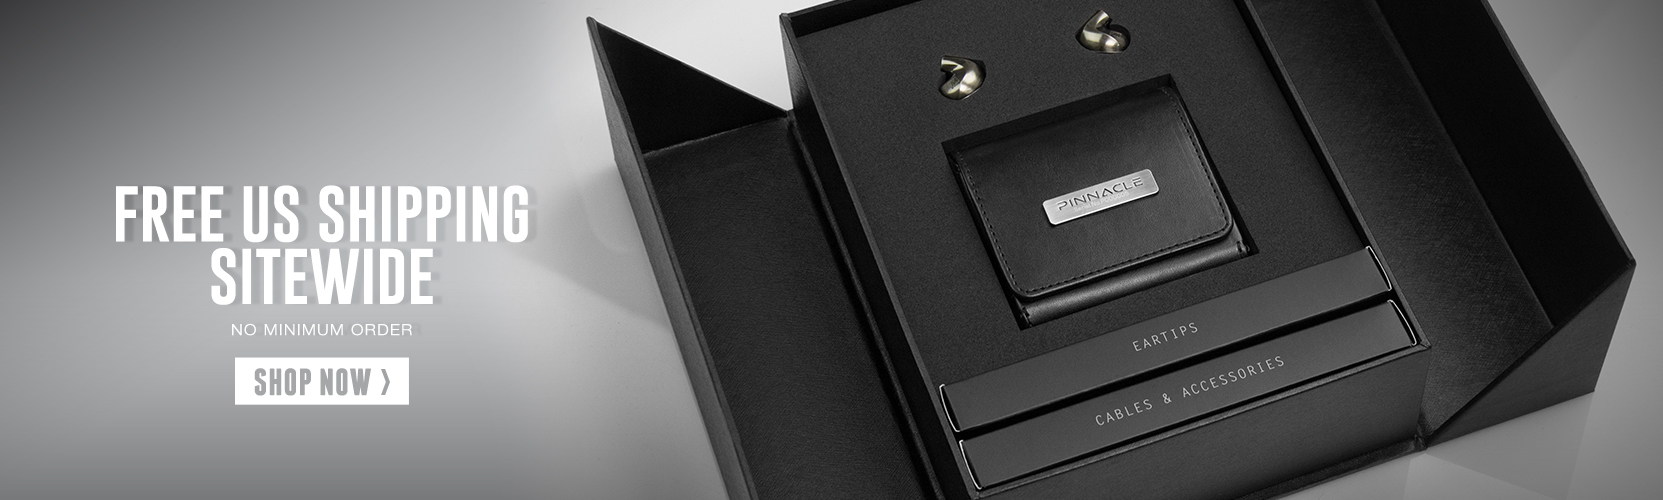 adidas Ultra Boost 1.0 OG Black Purple Gold Size 10.5 eBay